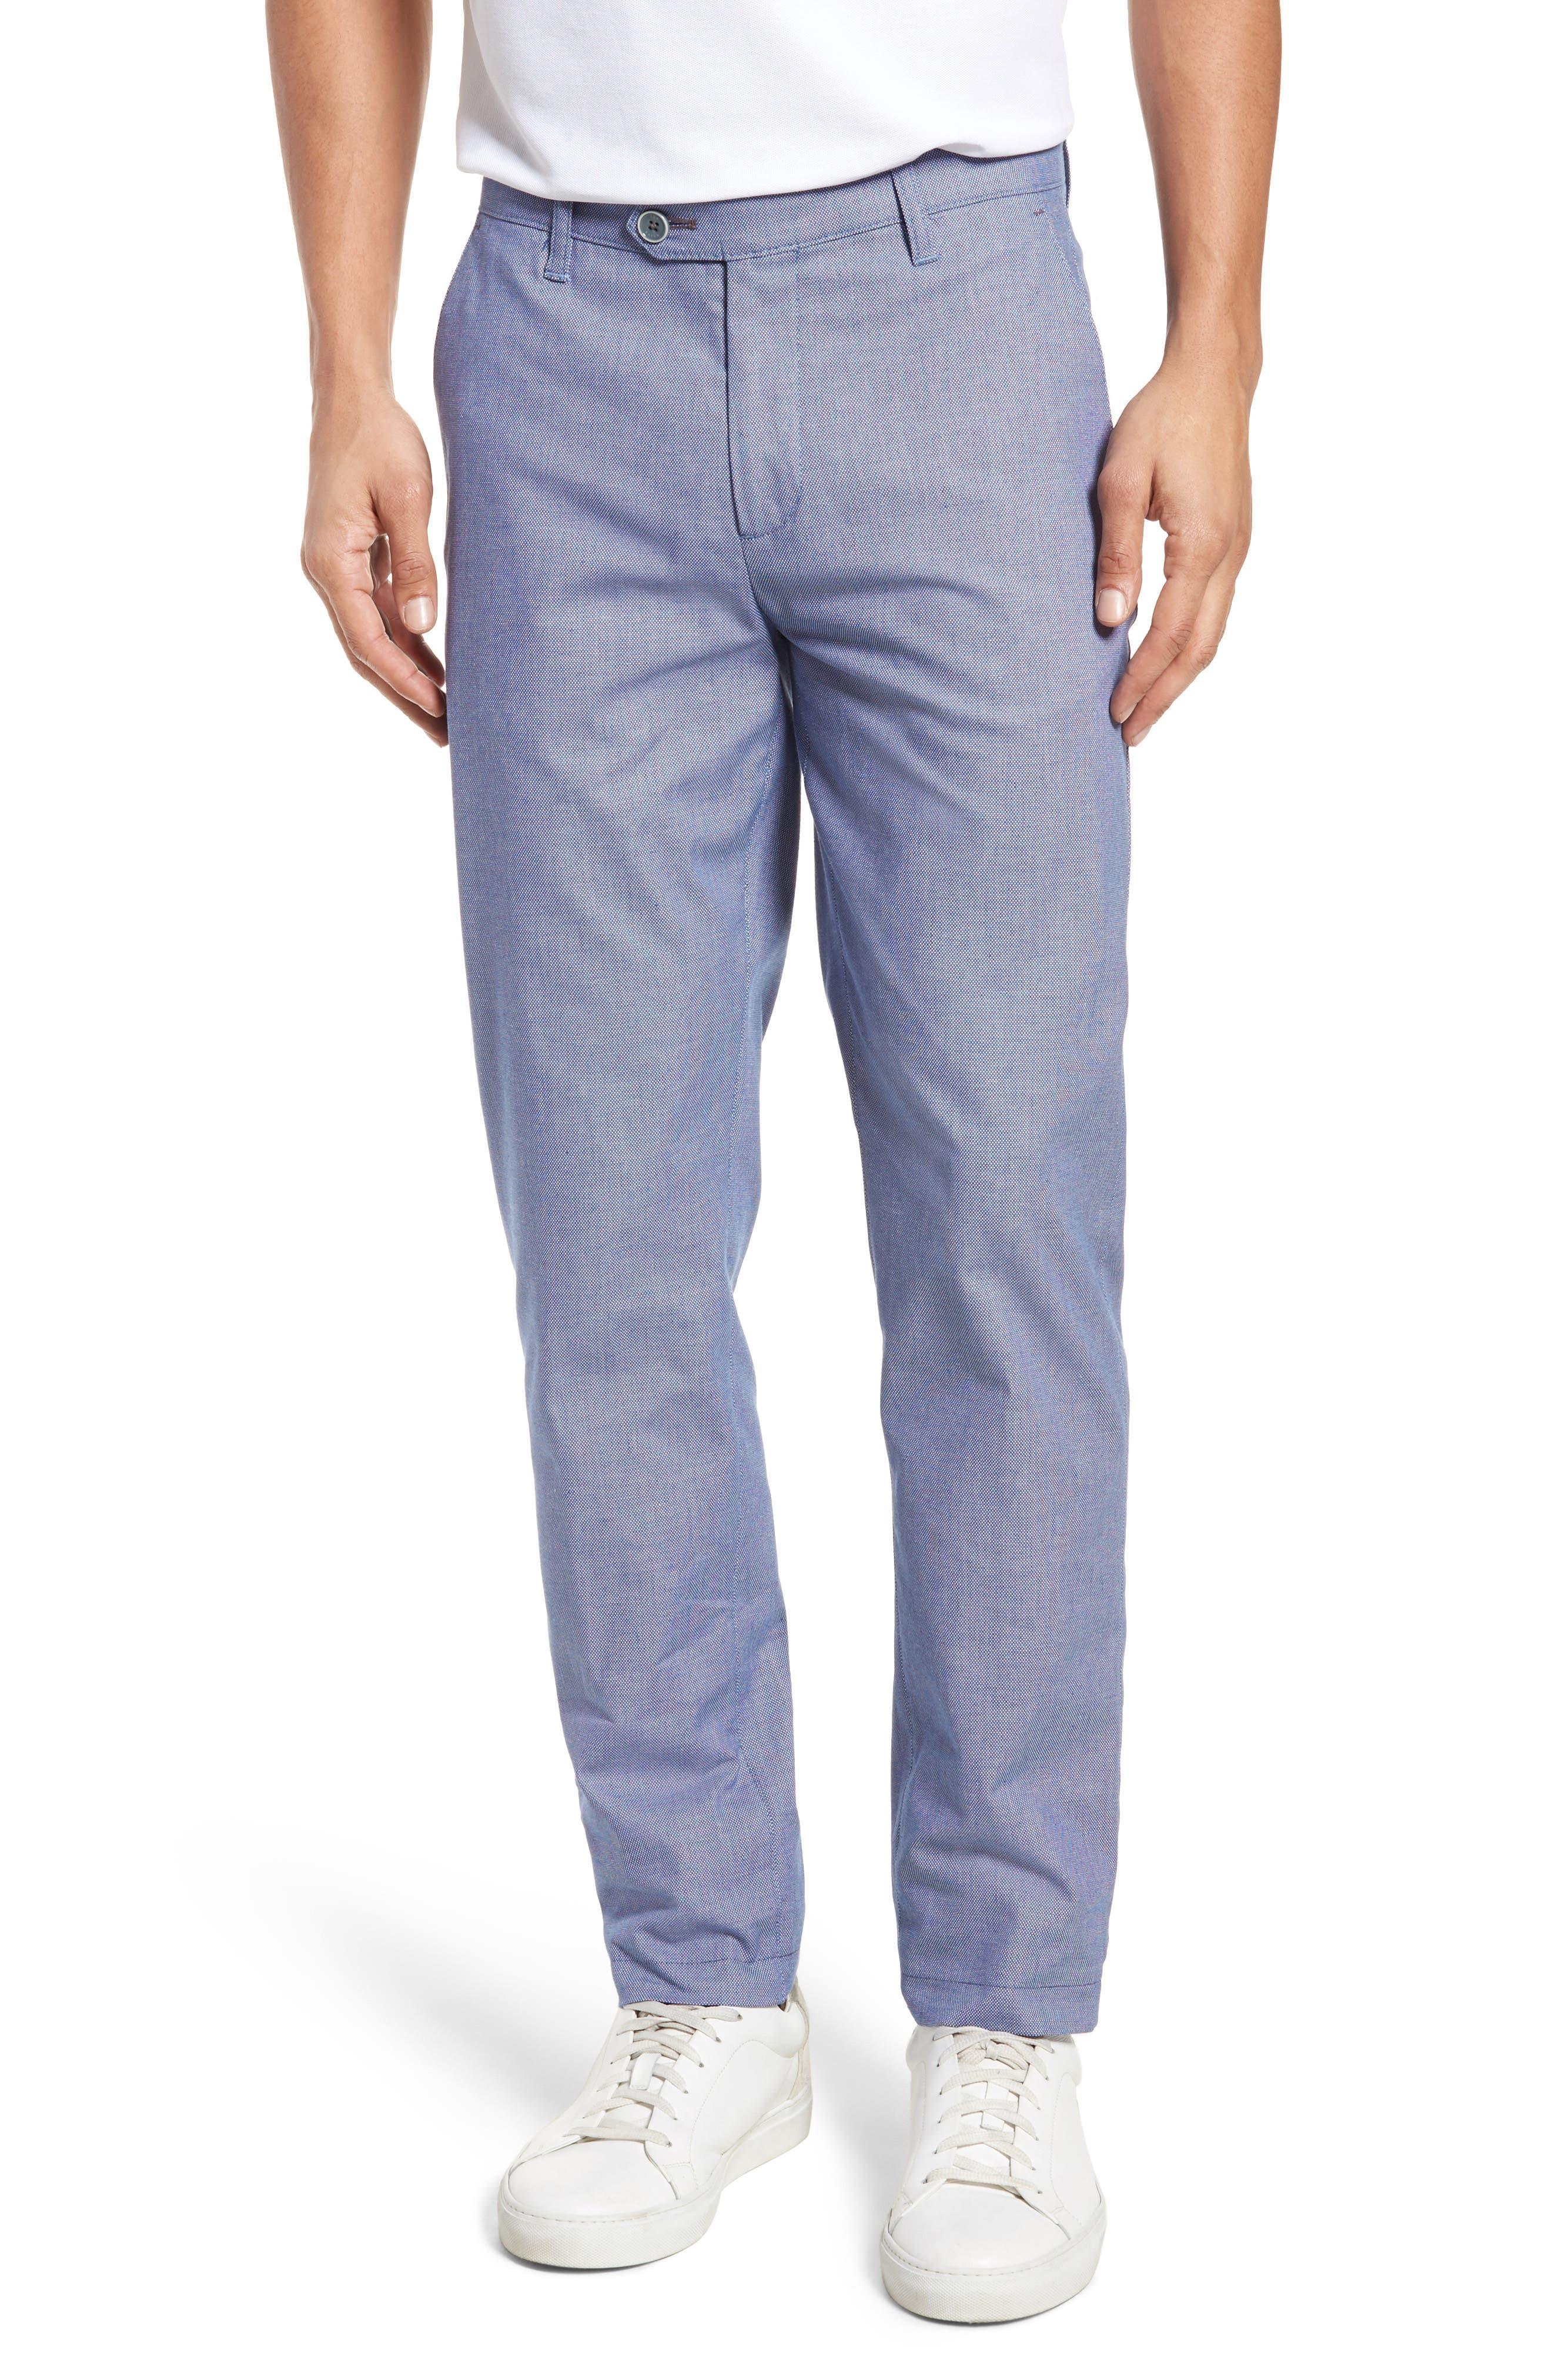 Holldet Flat Front Stretch Solid Cotton Pants,                             Main thumbnail 1, color,                             Light Blue